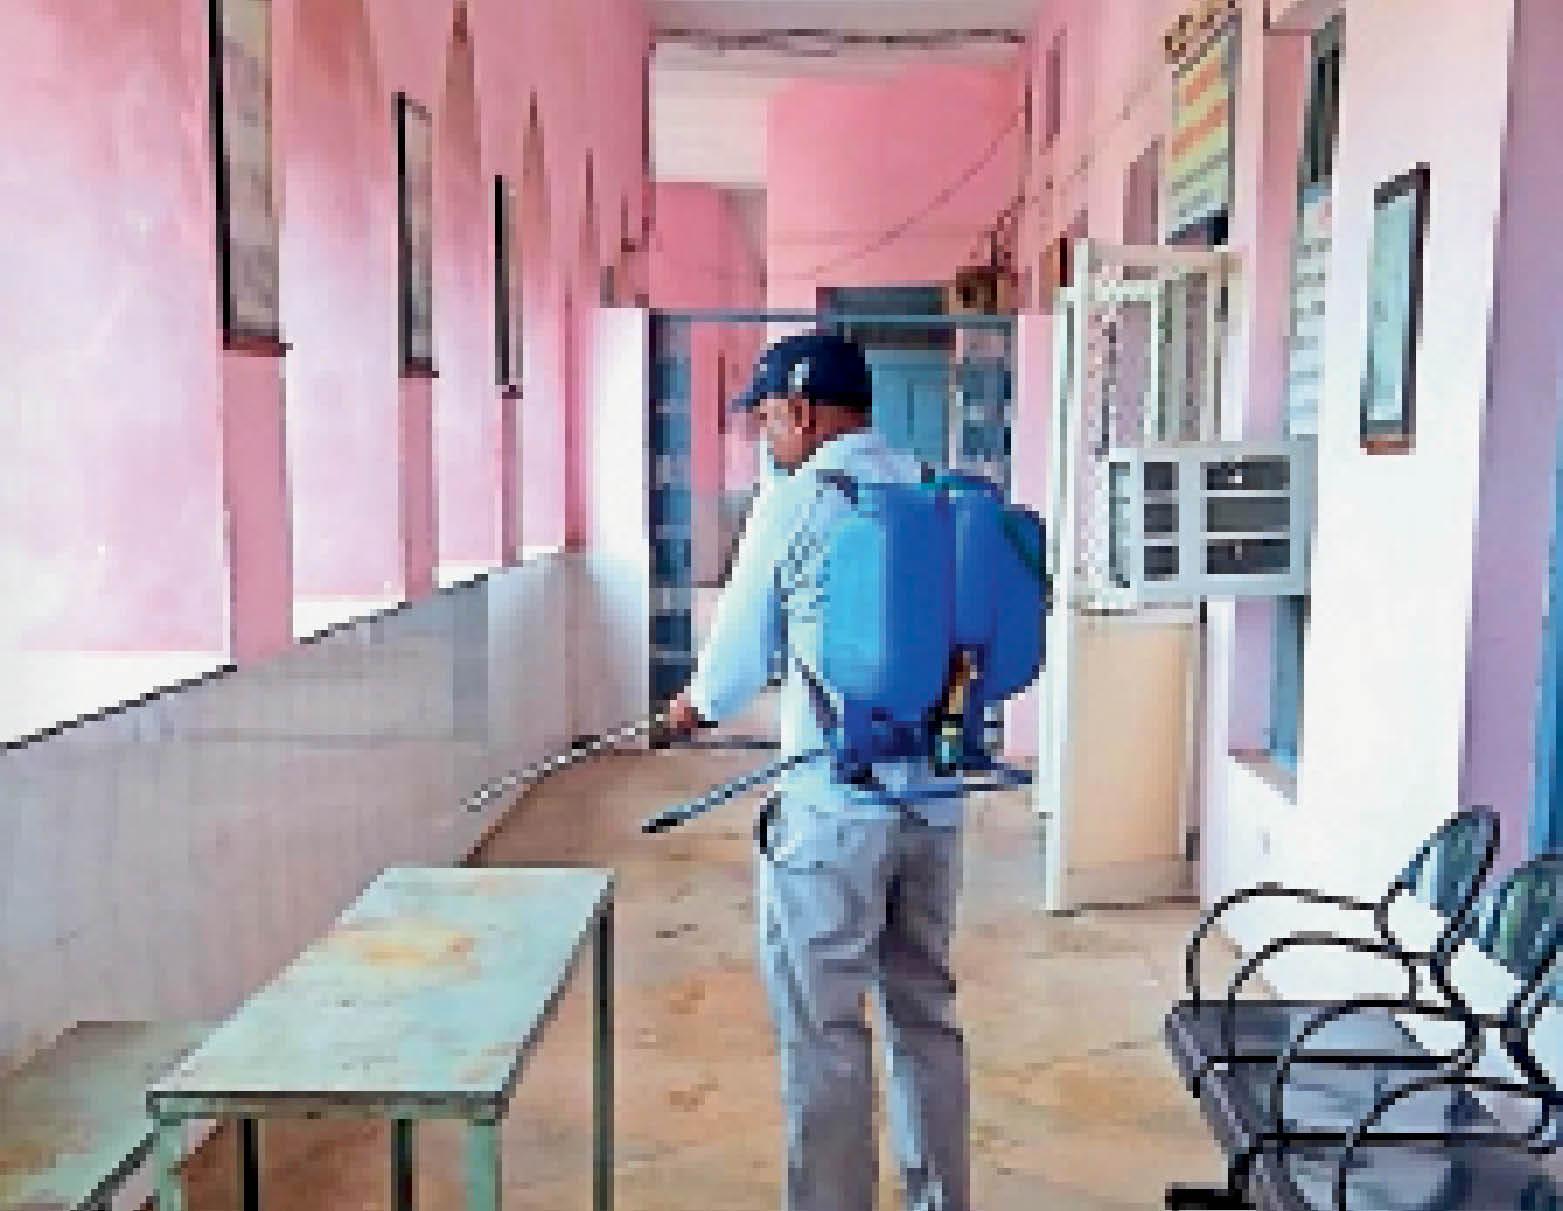 क्लास रूम को सैनिटाइज करते हुए। - Dainik Bhaskar